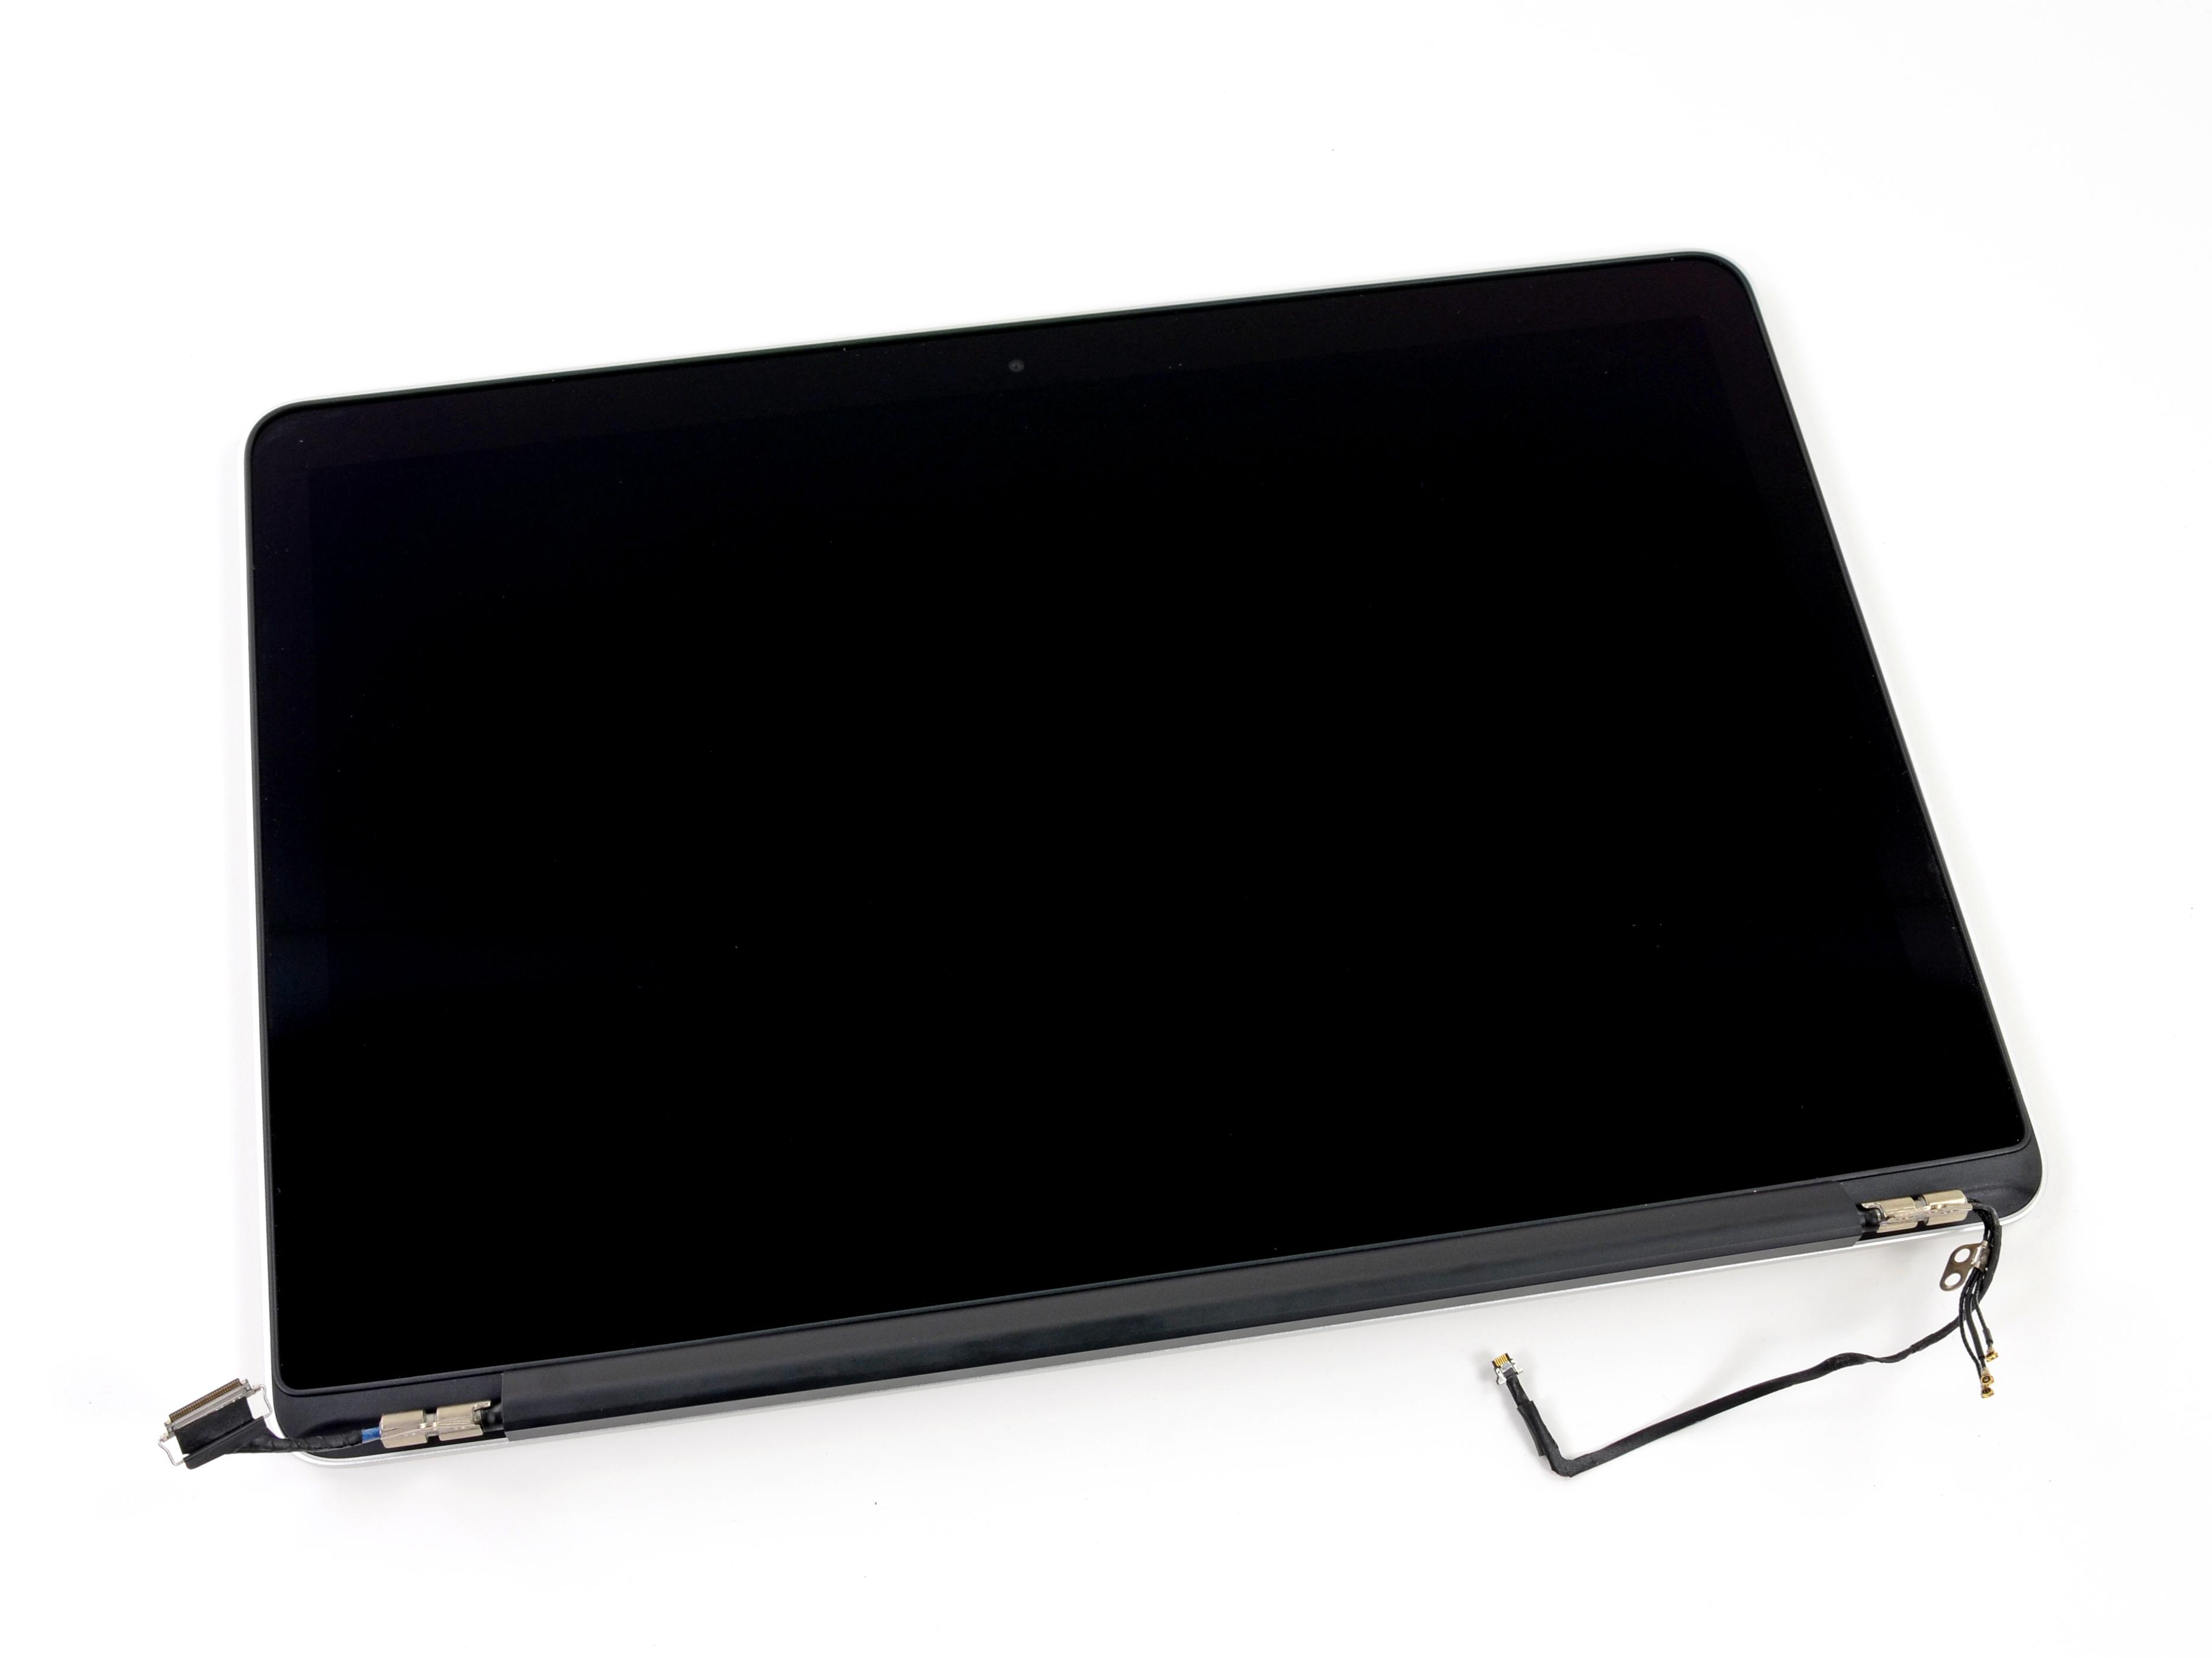 Flexgate' might be Apple's next MacBook Pro problem - The Verge